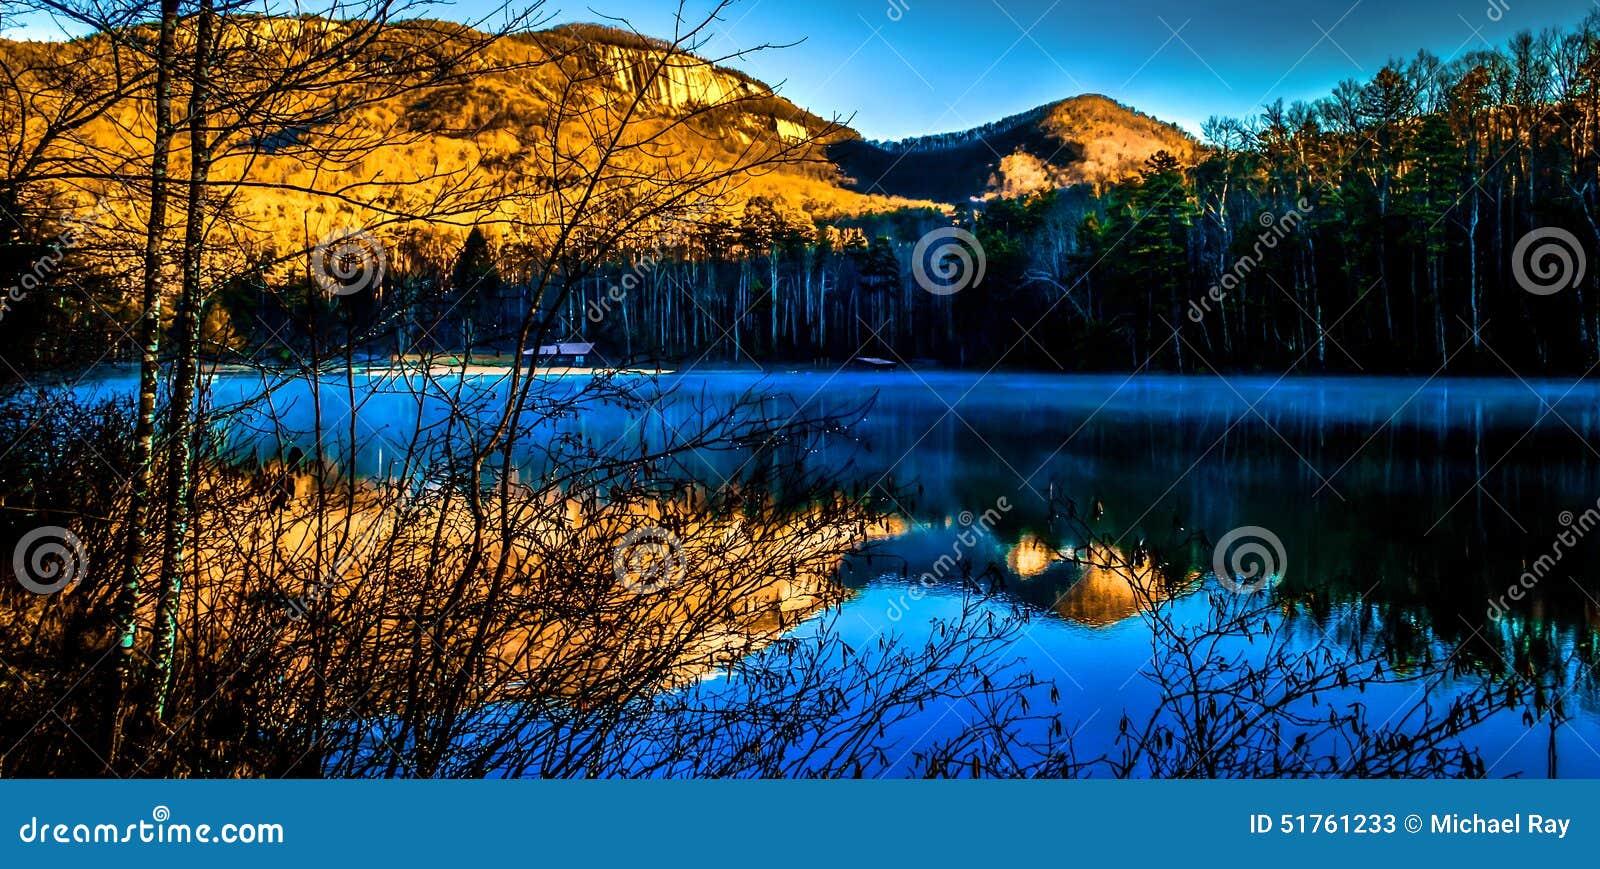 Pinnacle Lake With Table Rock Mountain